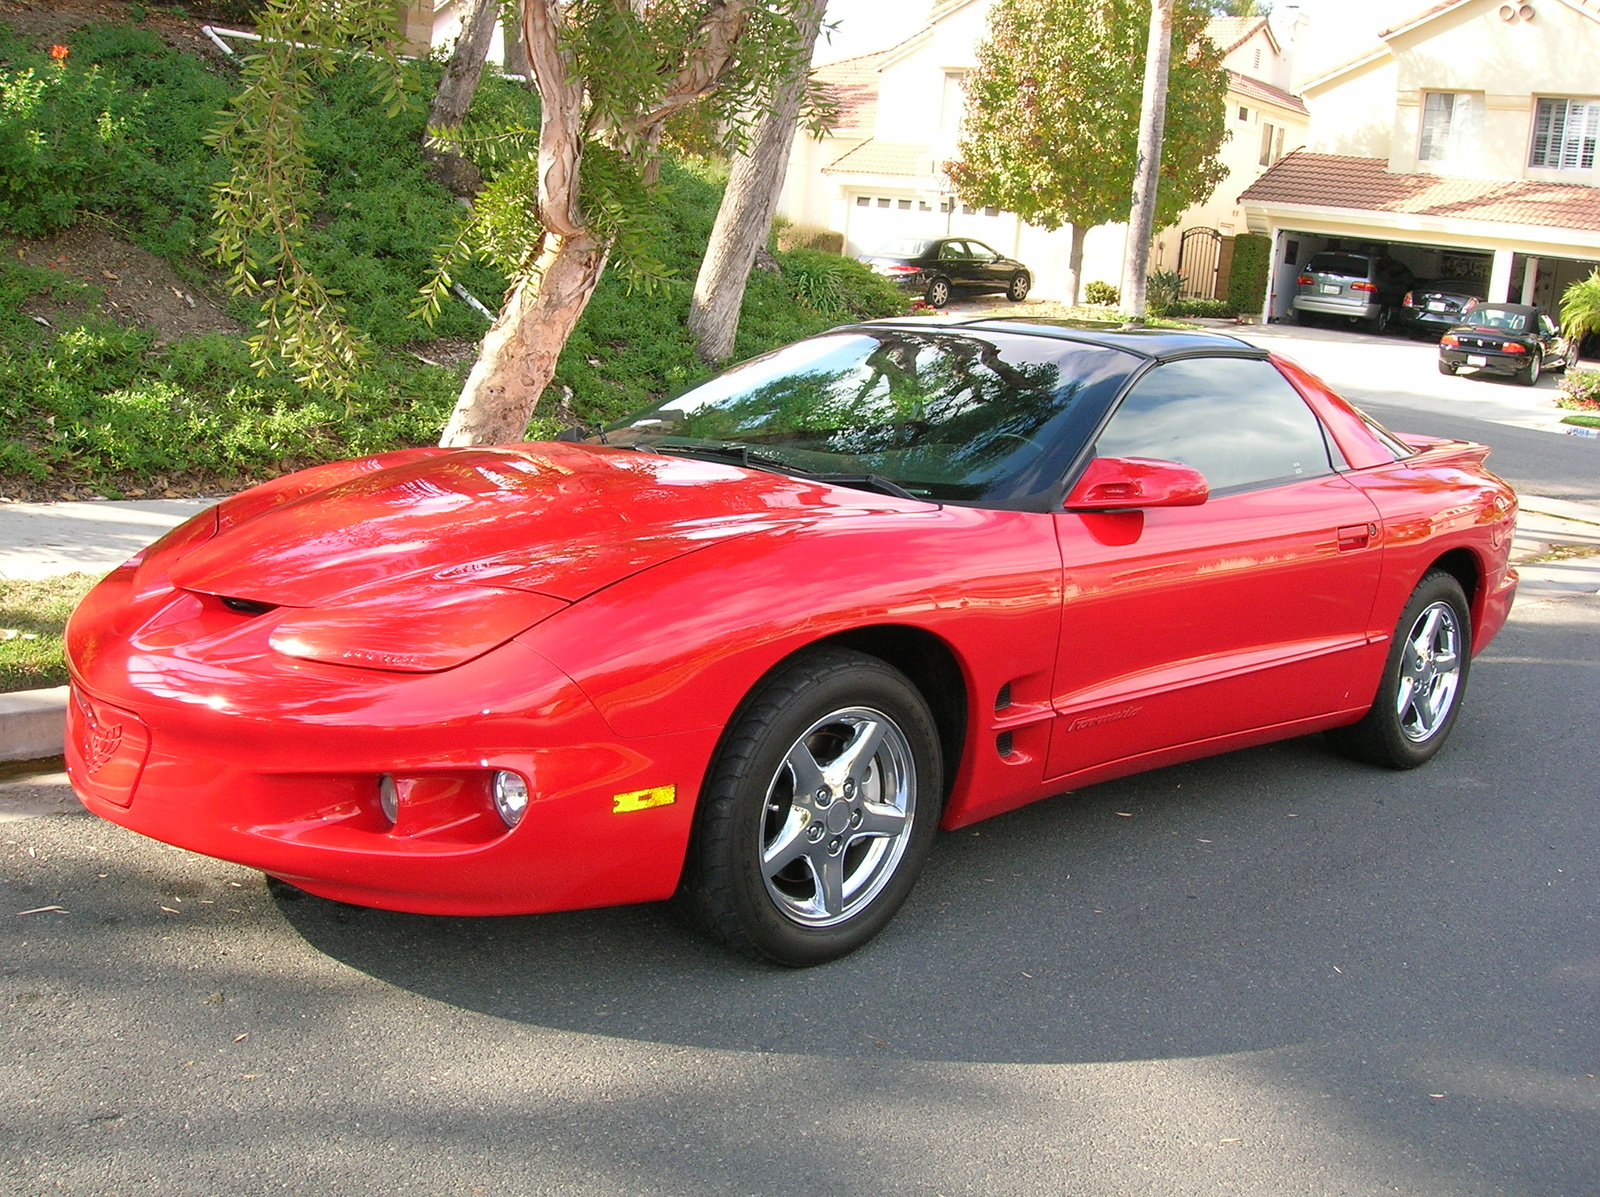 Picture of 2001 Pontiac Firebird Formula